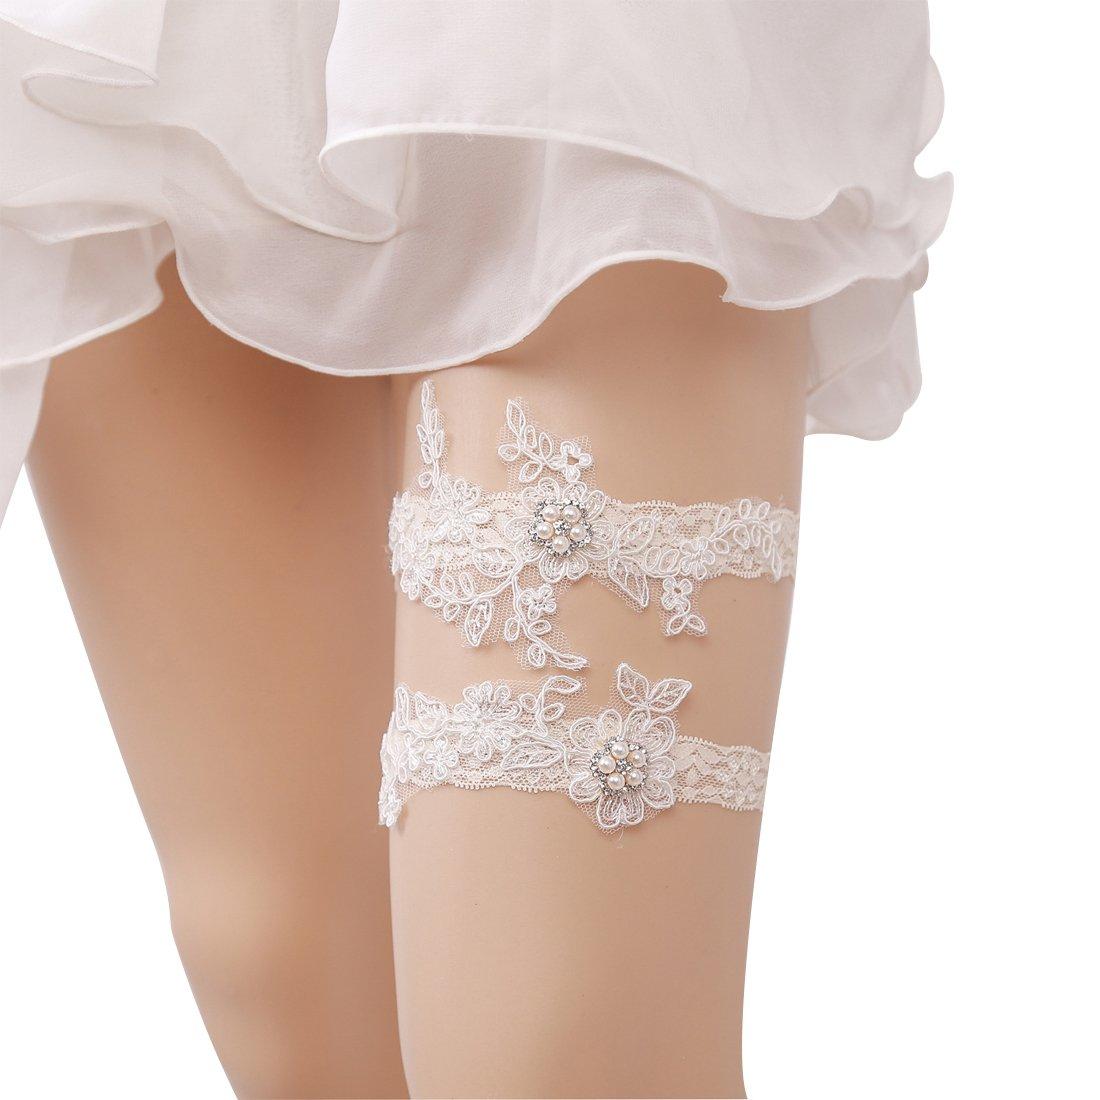 Minsto Bridal Ivory Floral Wedding Lace Retro Garters for Bride (J032)